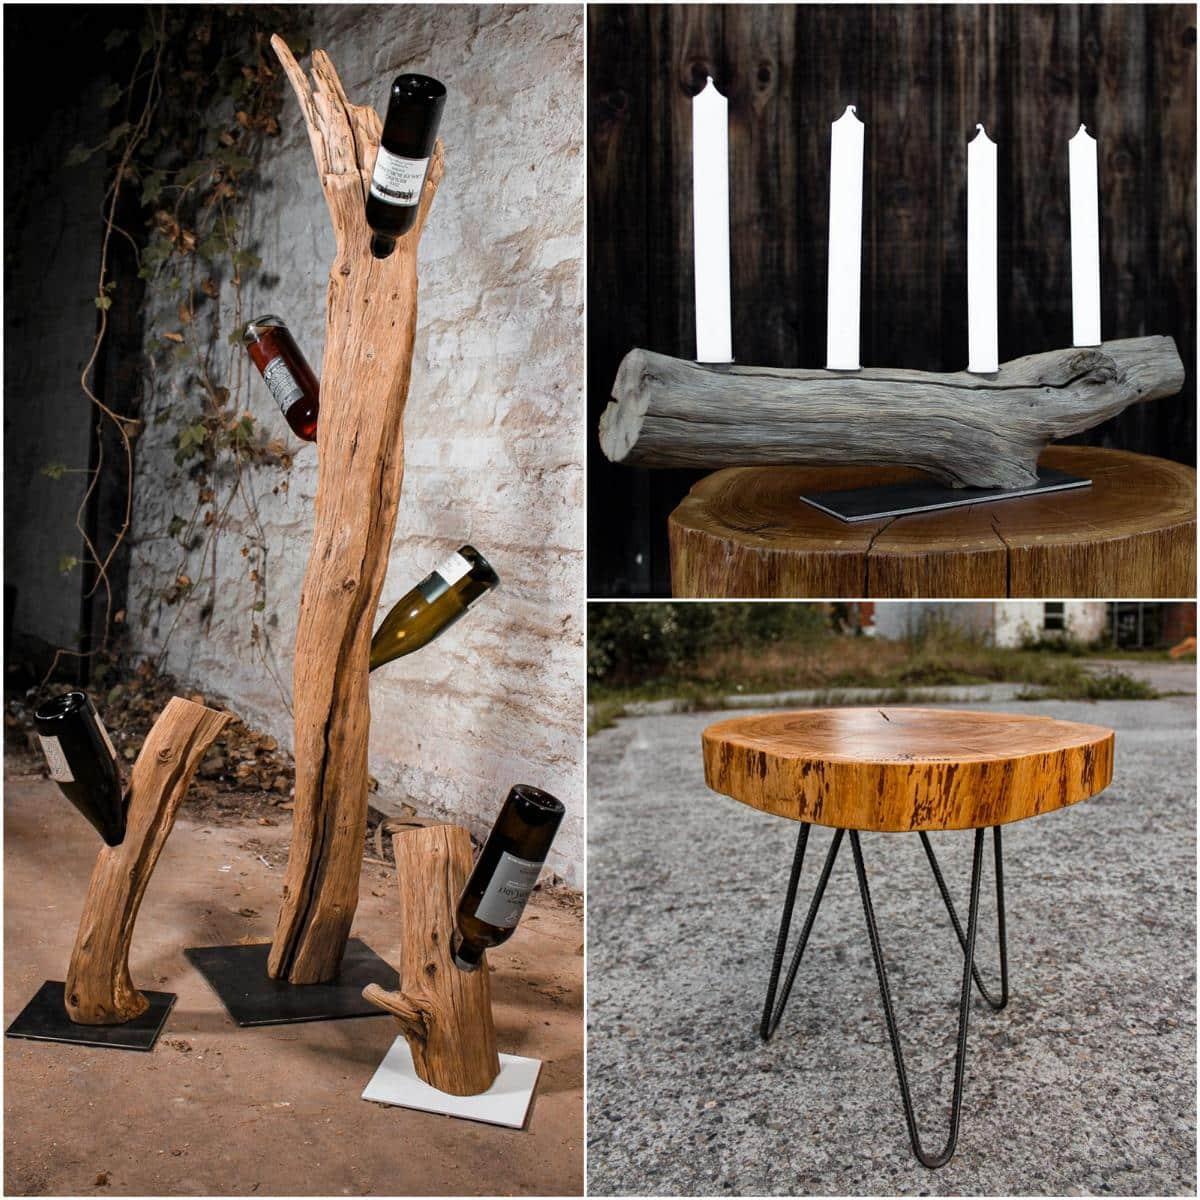 Style Hannover oakbrother Accessoires - Oakbrother - einzigartige & nachhaltige Massivholz-Objekte